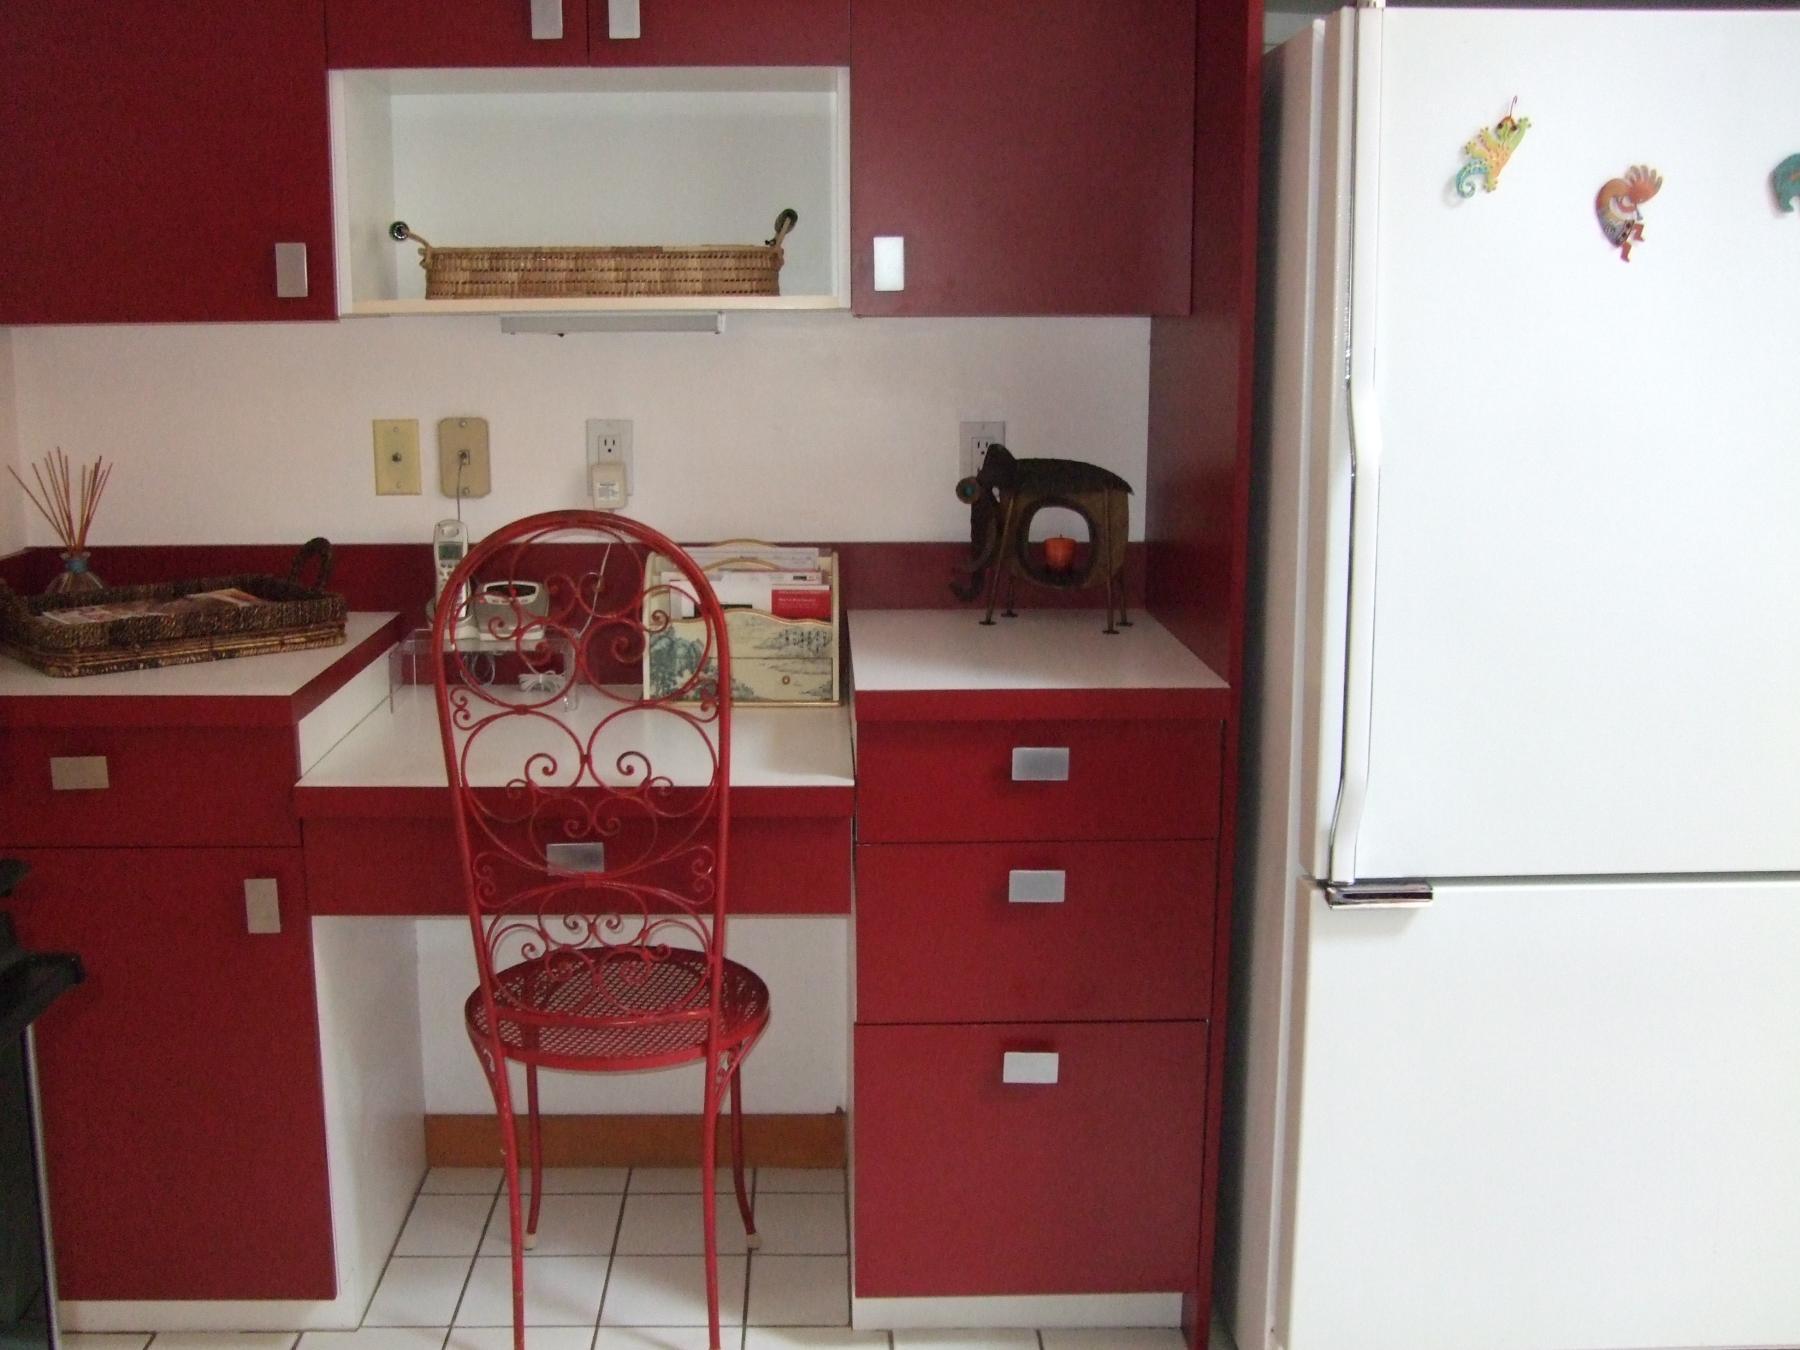 Kitchen Design Ideas Fuji 013a Jpg